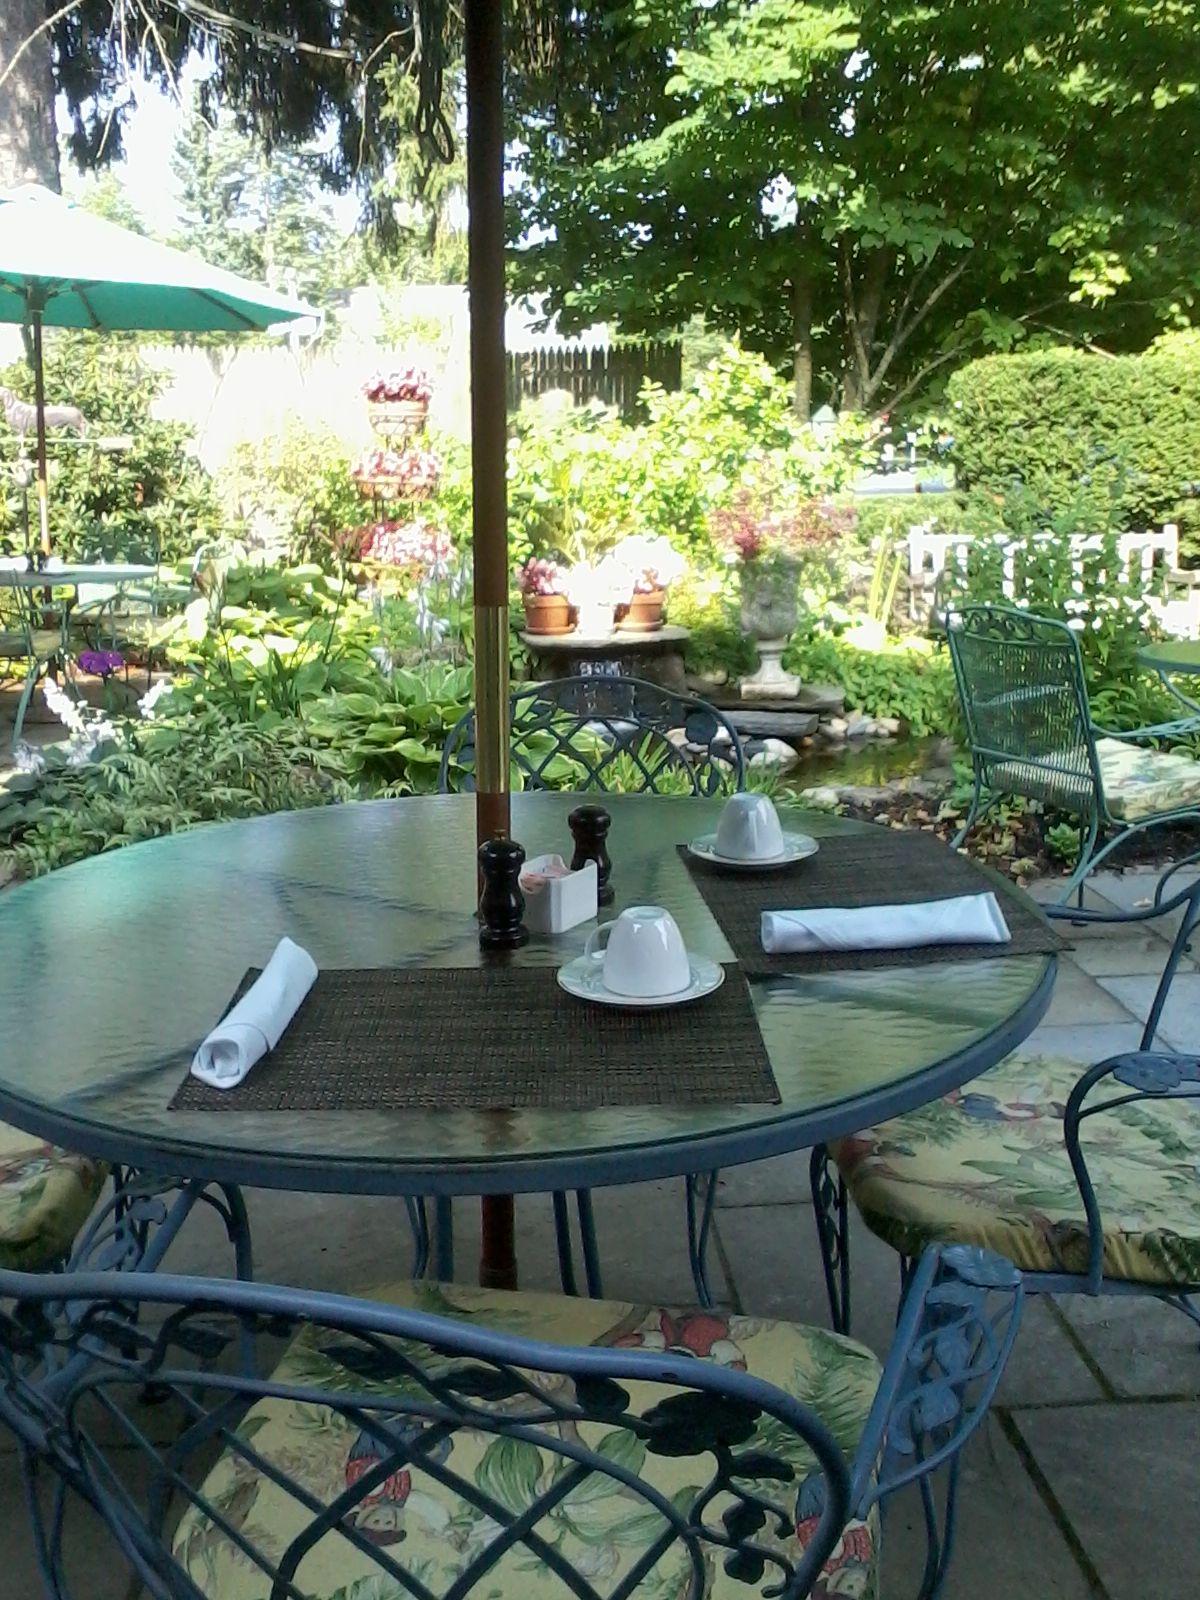 Enjoy breakfast on the terrace at The Village Inn of